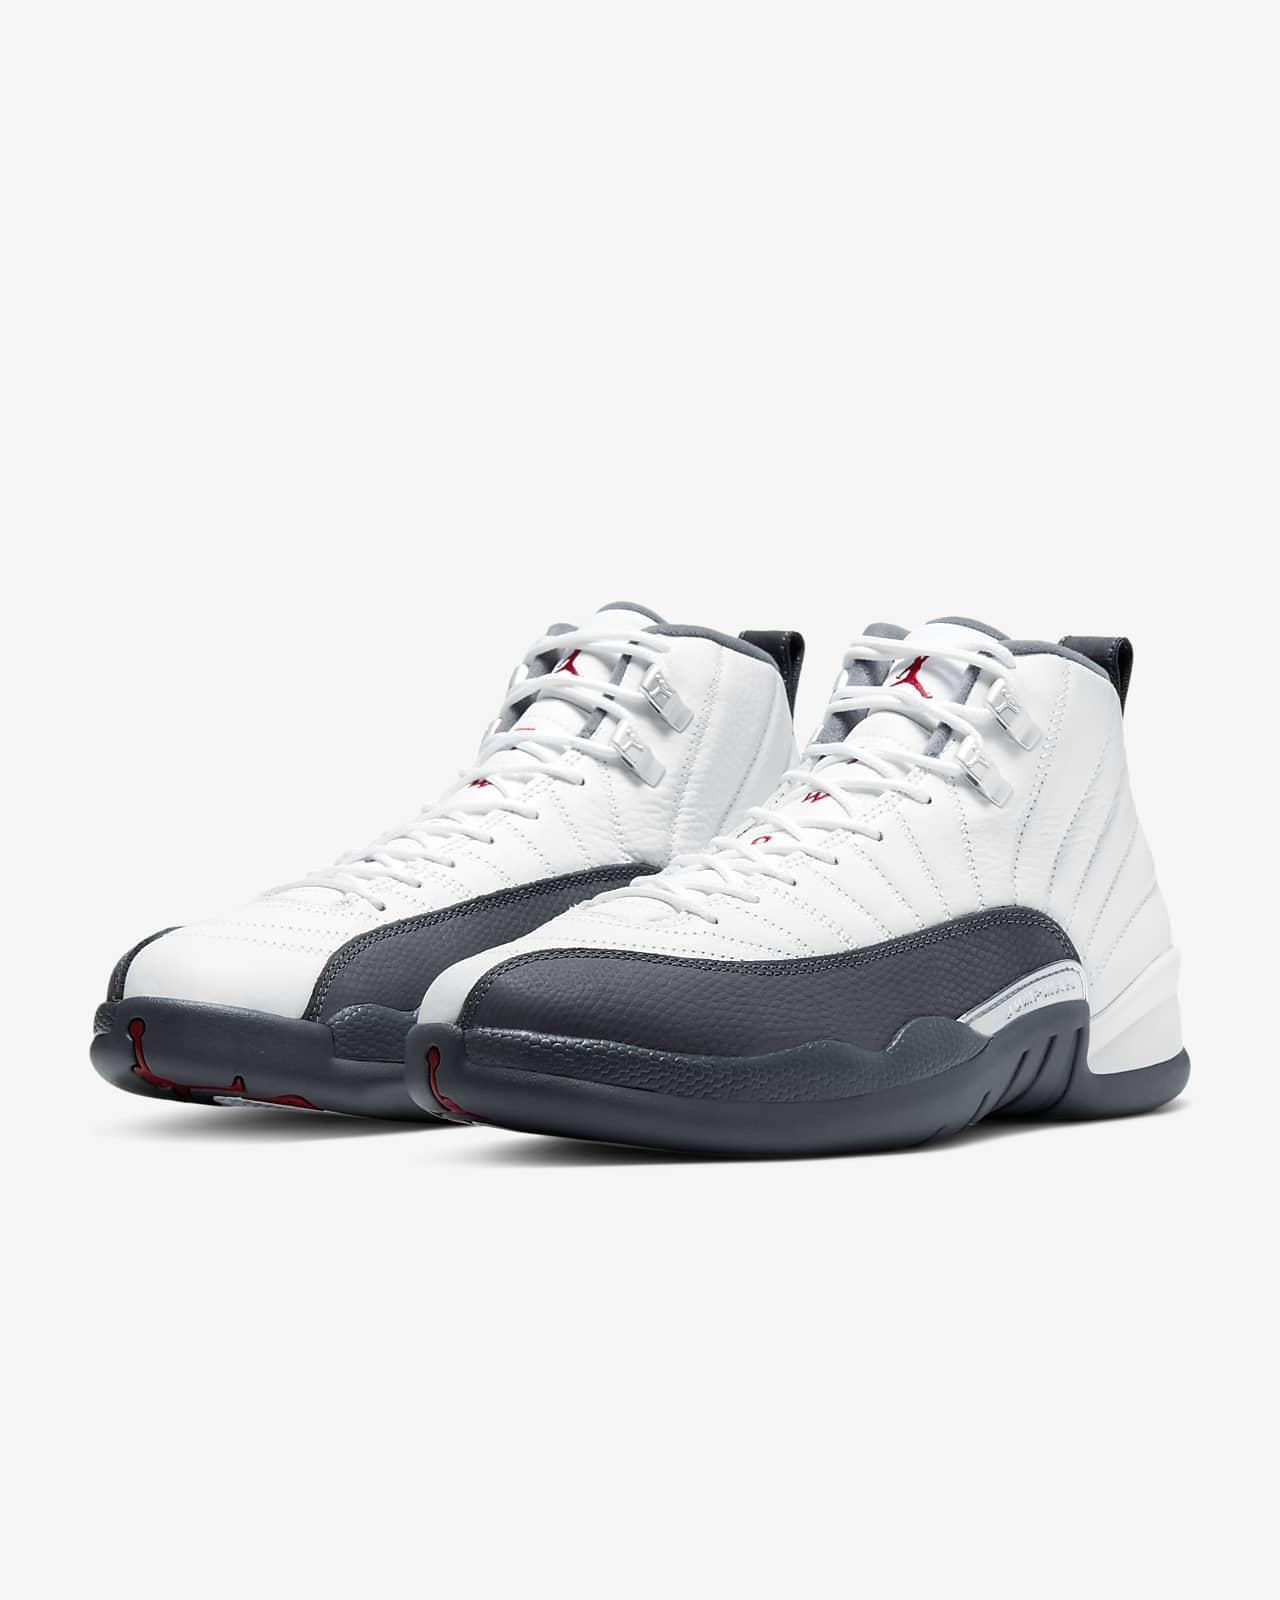 Air Jordan 12 Retro Shoe